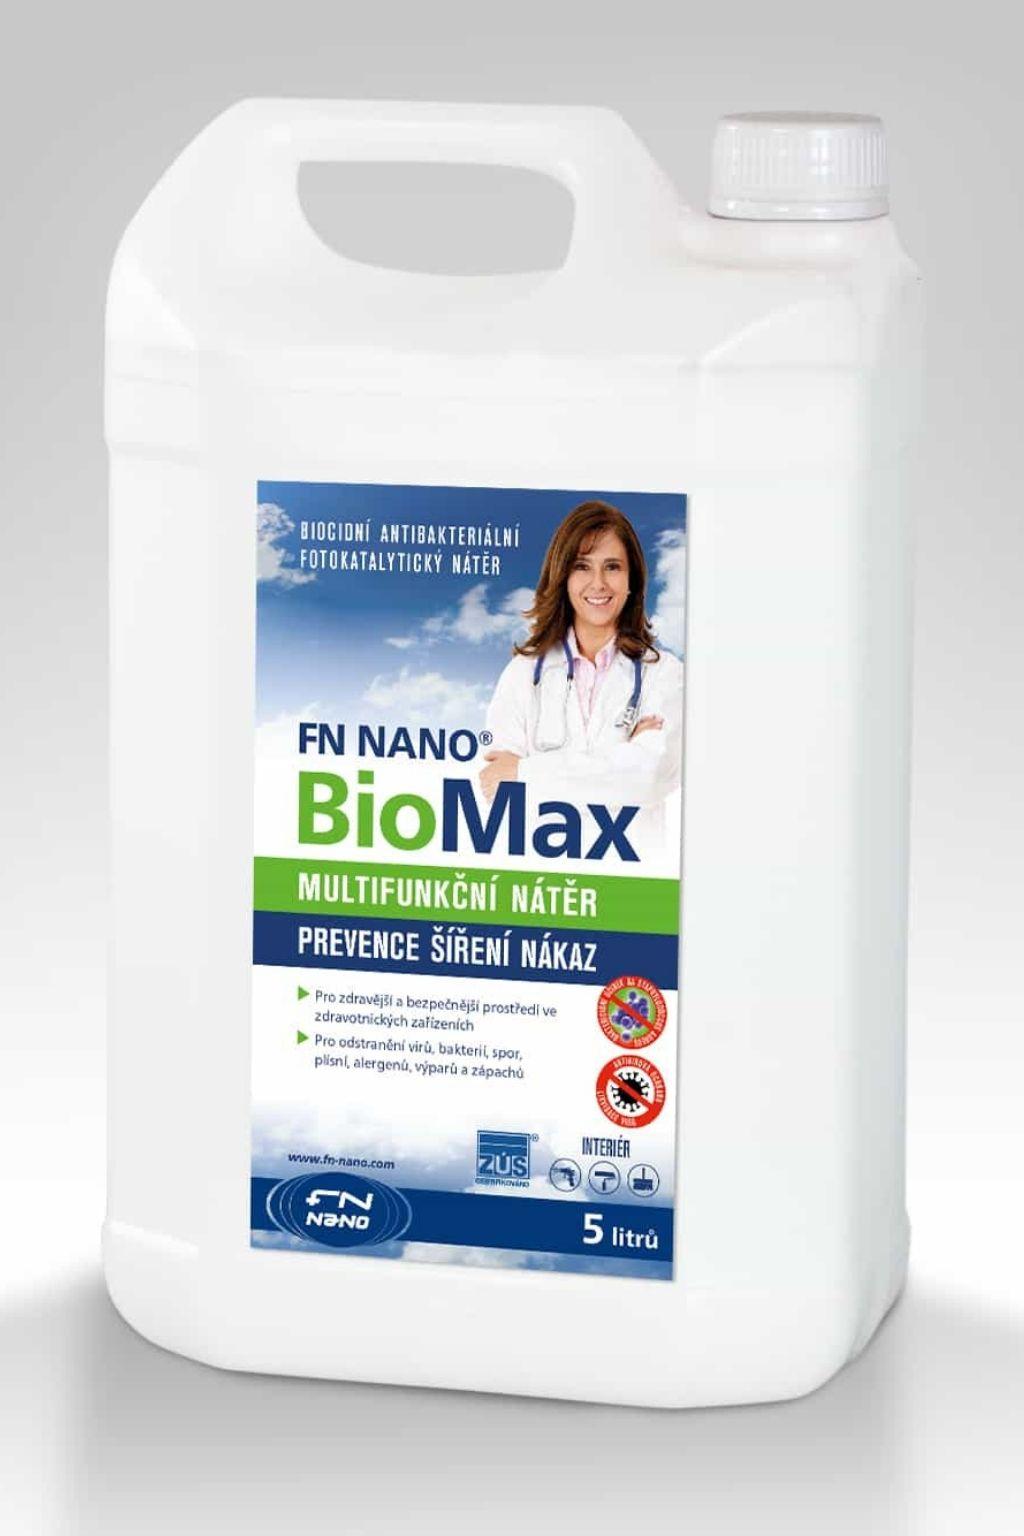 FN NANO Funkční nátěr FN® 1 BioMax Objem: 1 litr